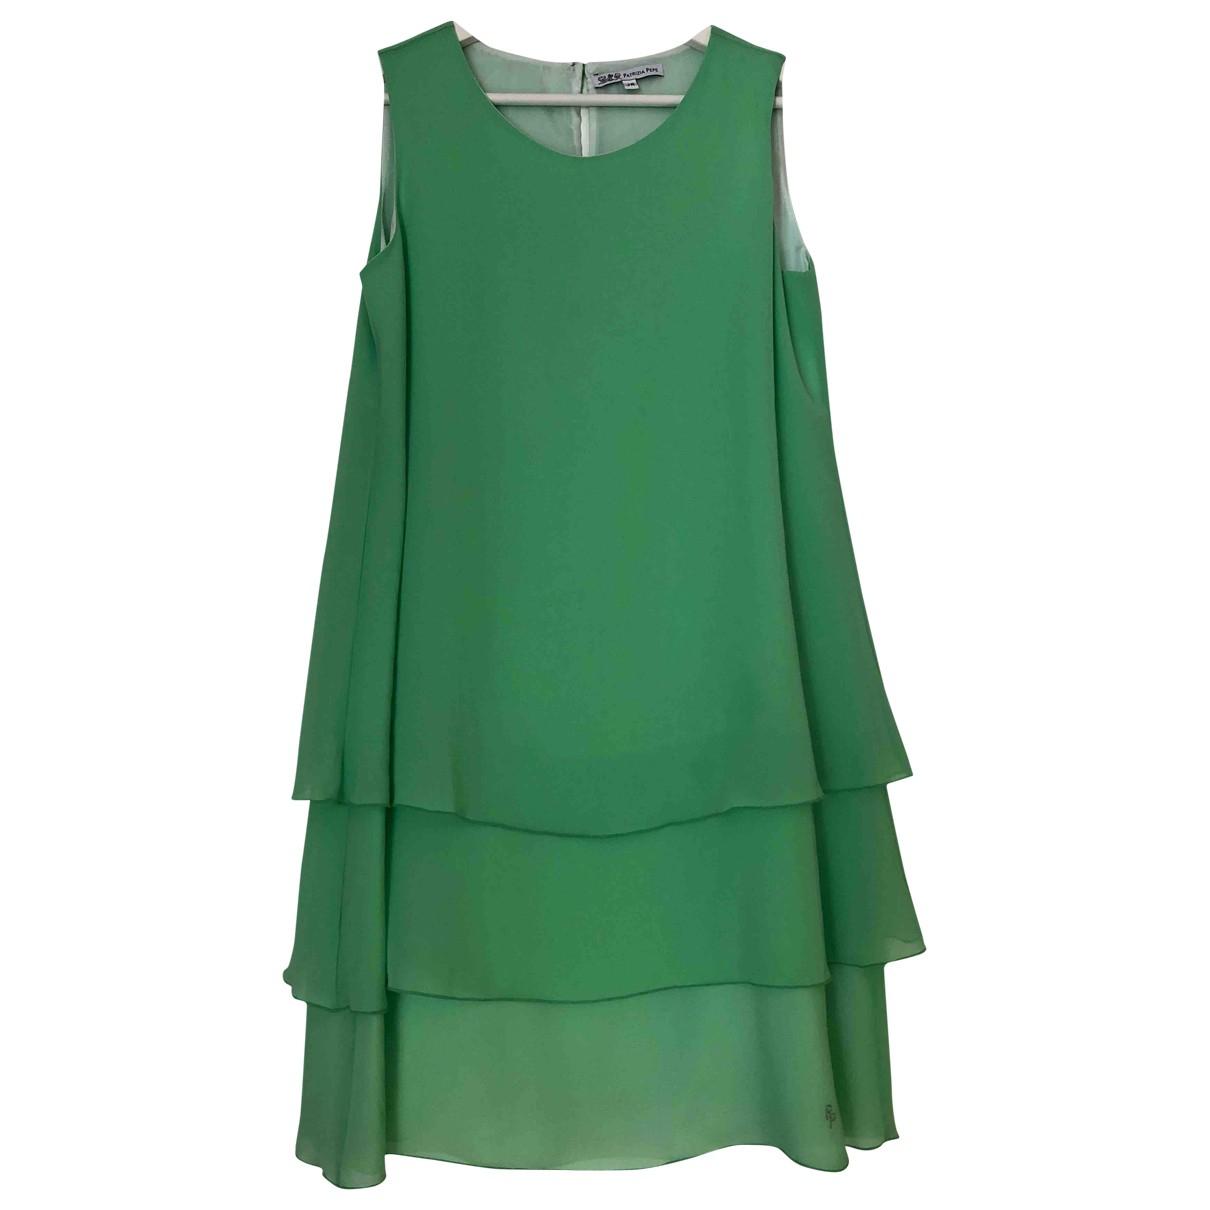 Patrizia Pepe \N Green dress for Kids 14 years - S FR